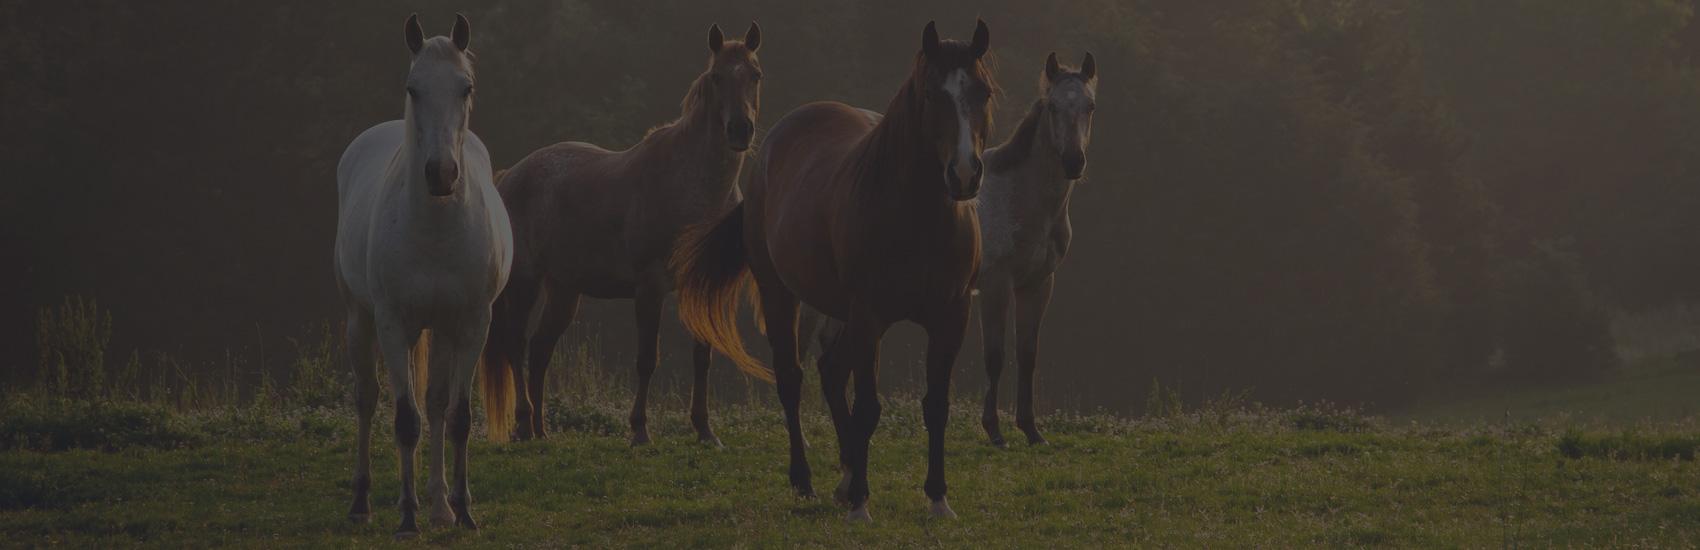 Vaudreuil-Soulanges in horseball mode